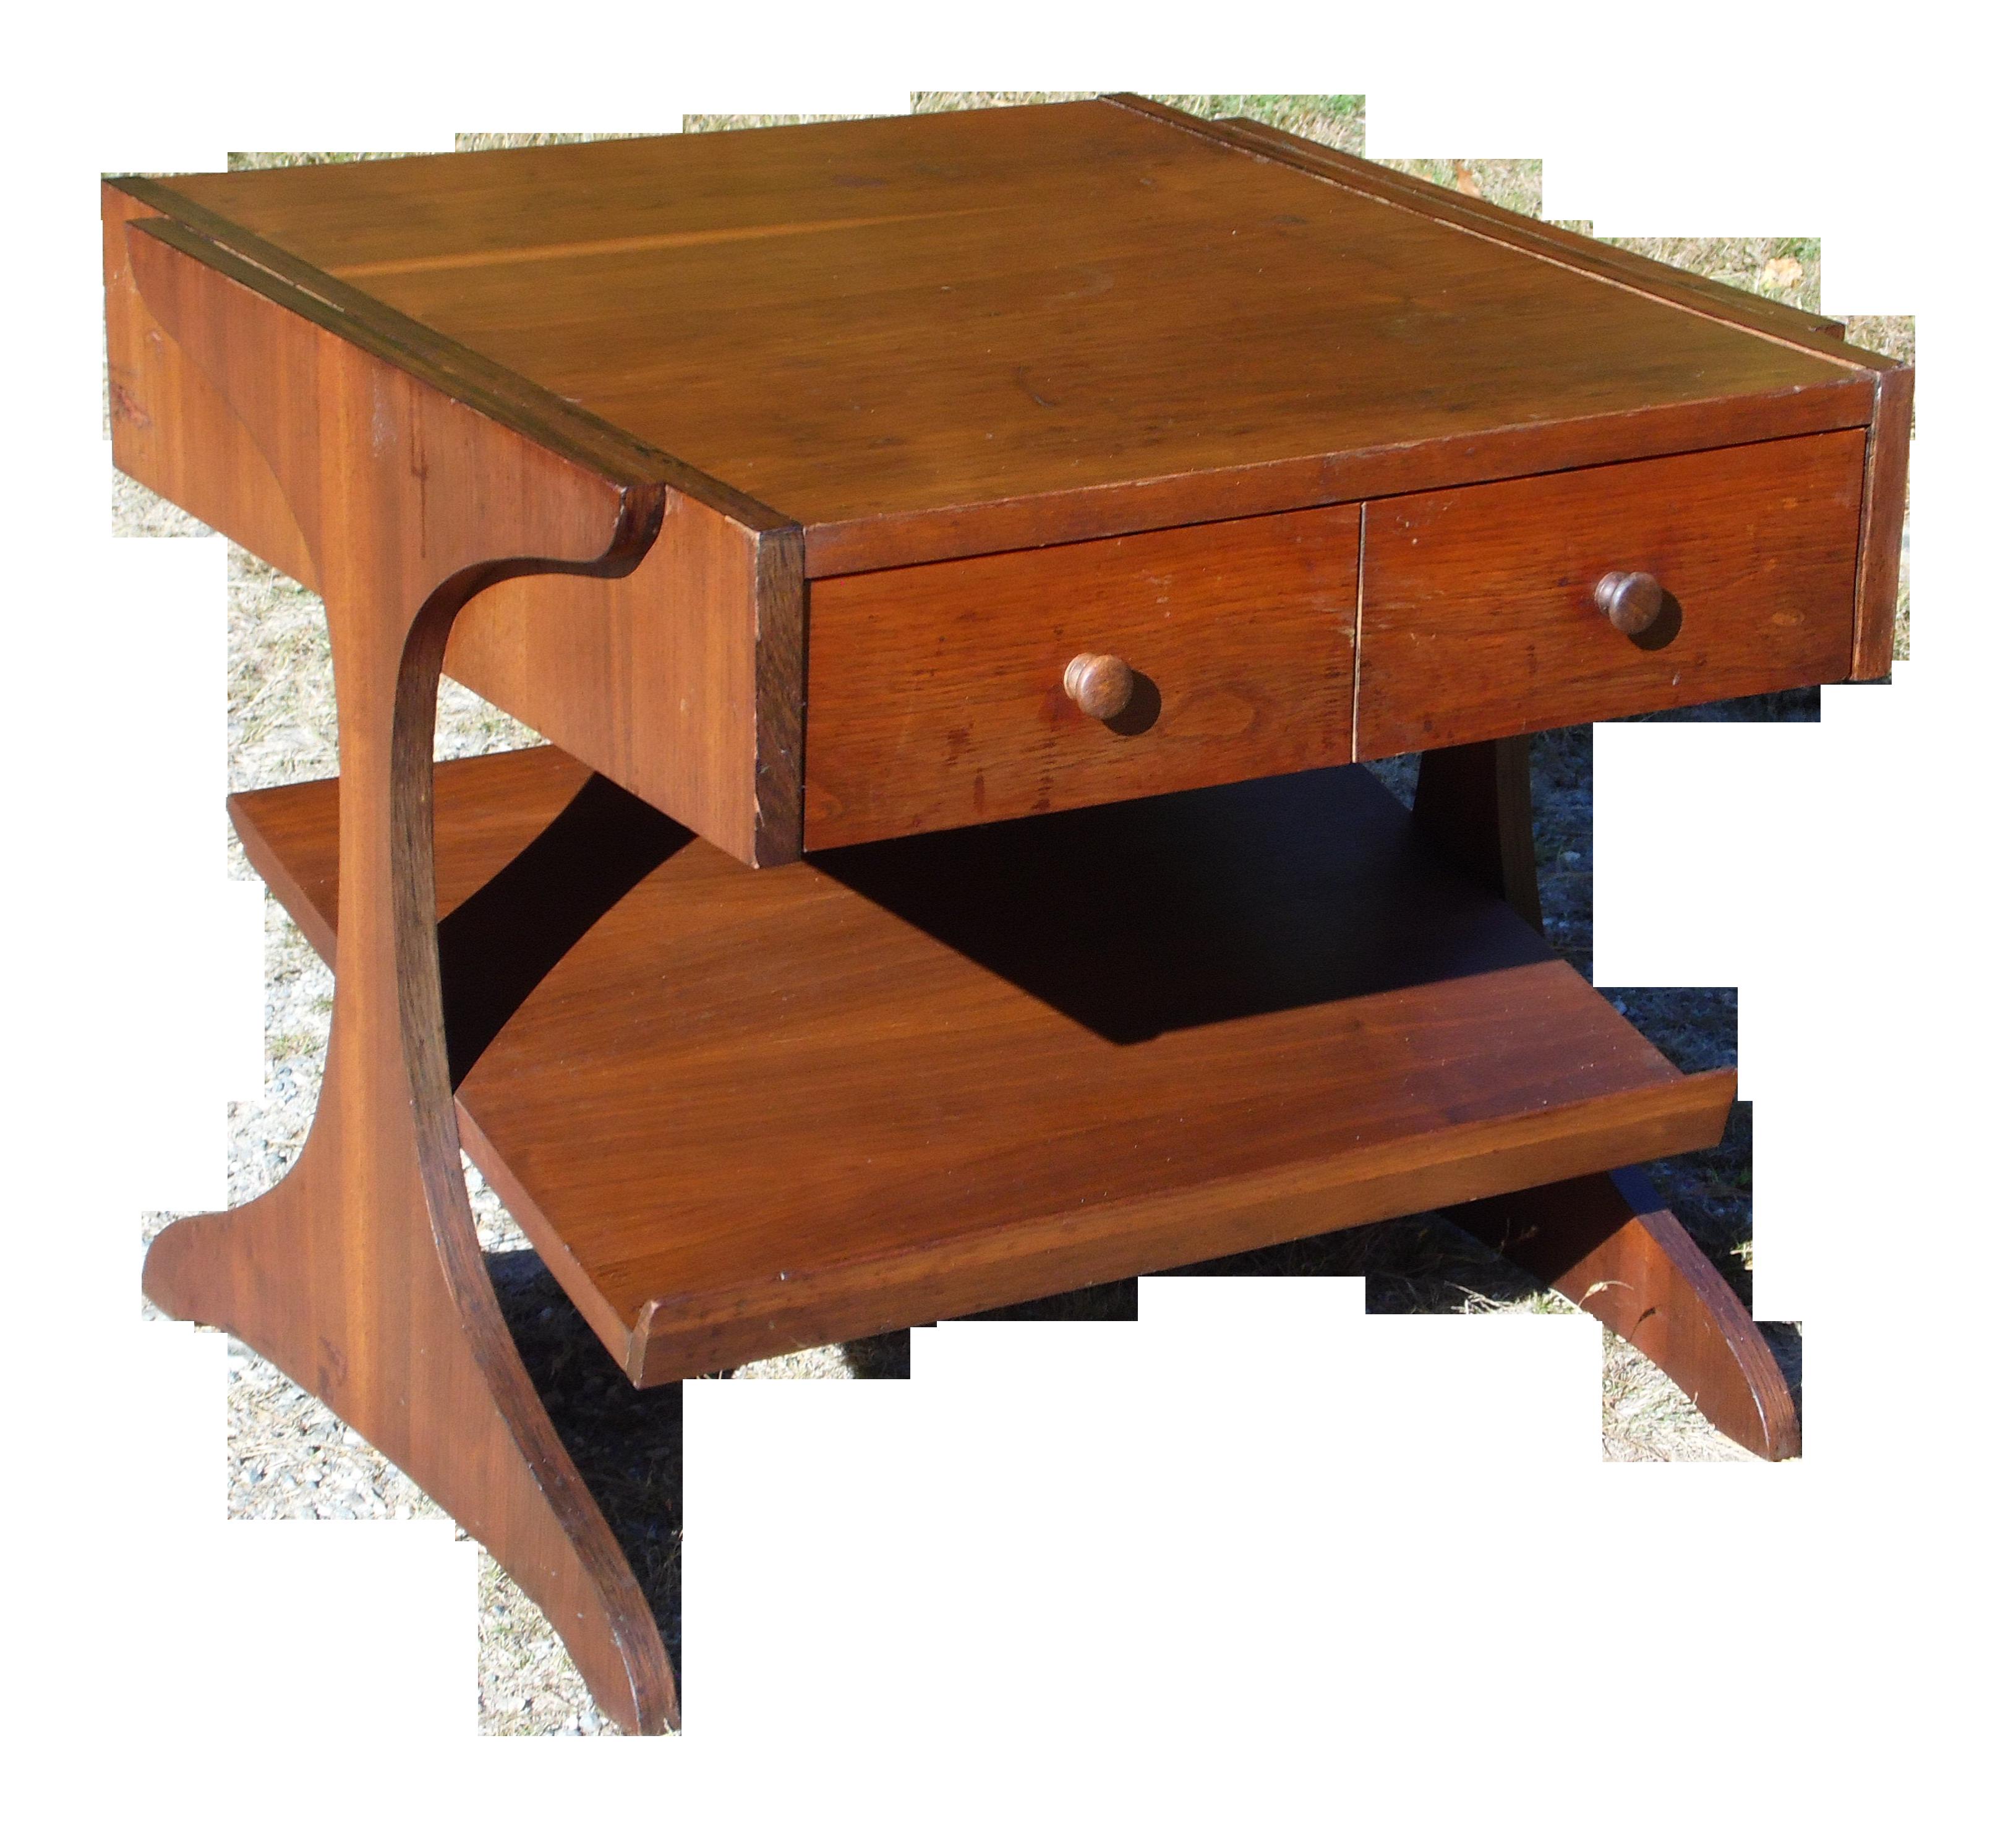 Vintage Mid Century Modern Walnut Kroehler Magazine Rack End Table Night Stand Chairish